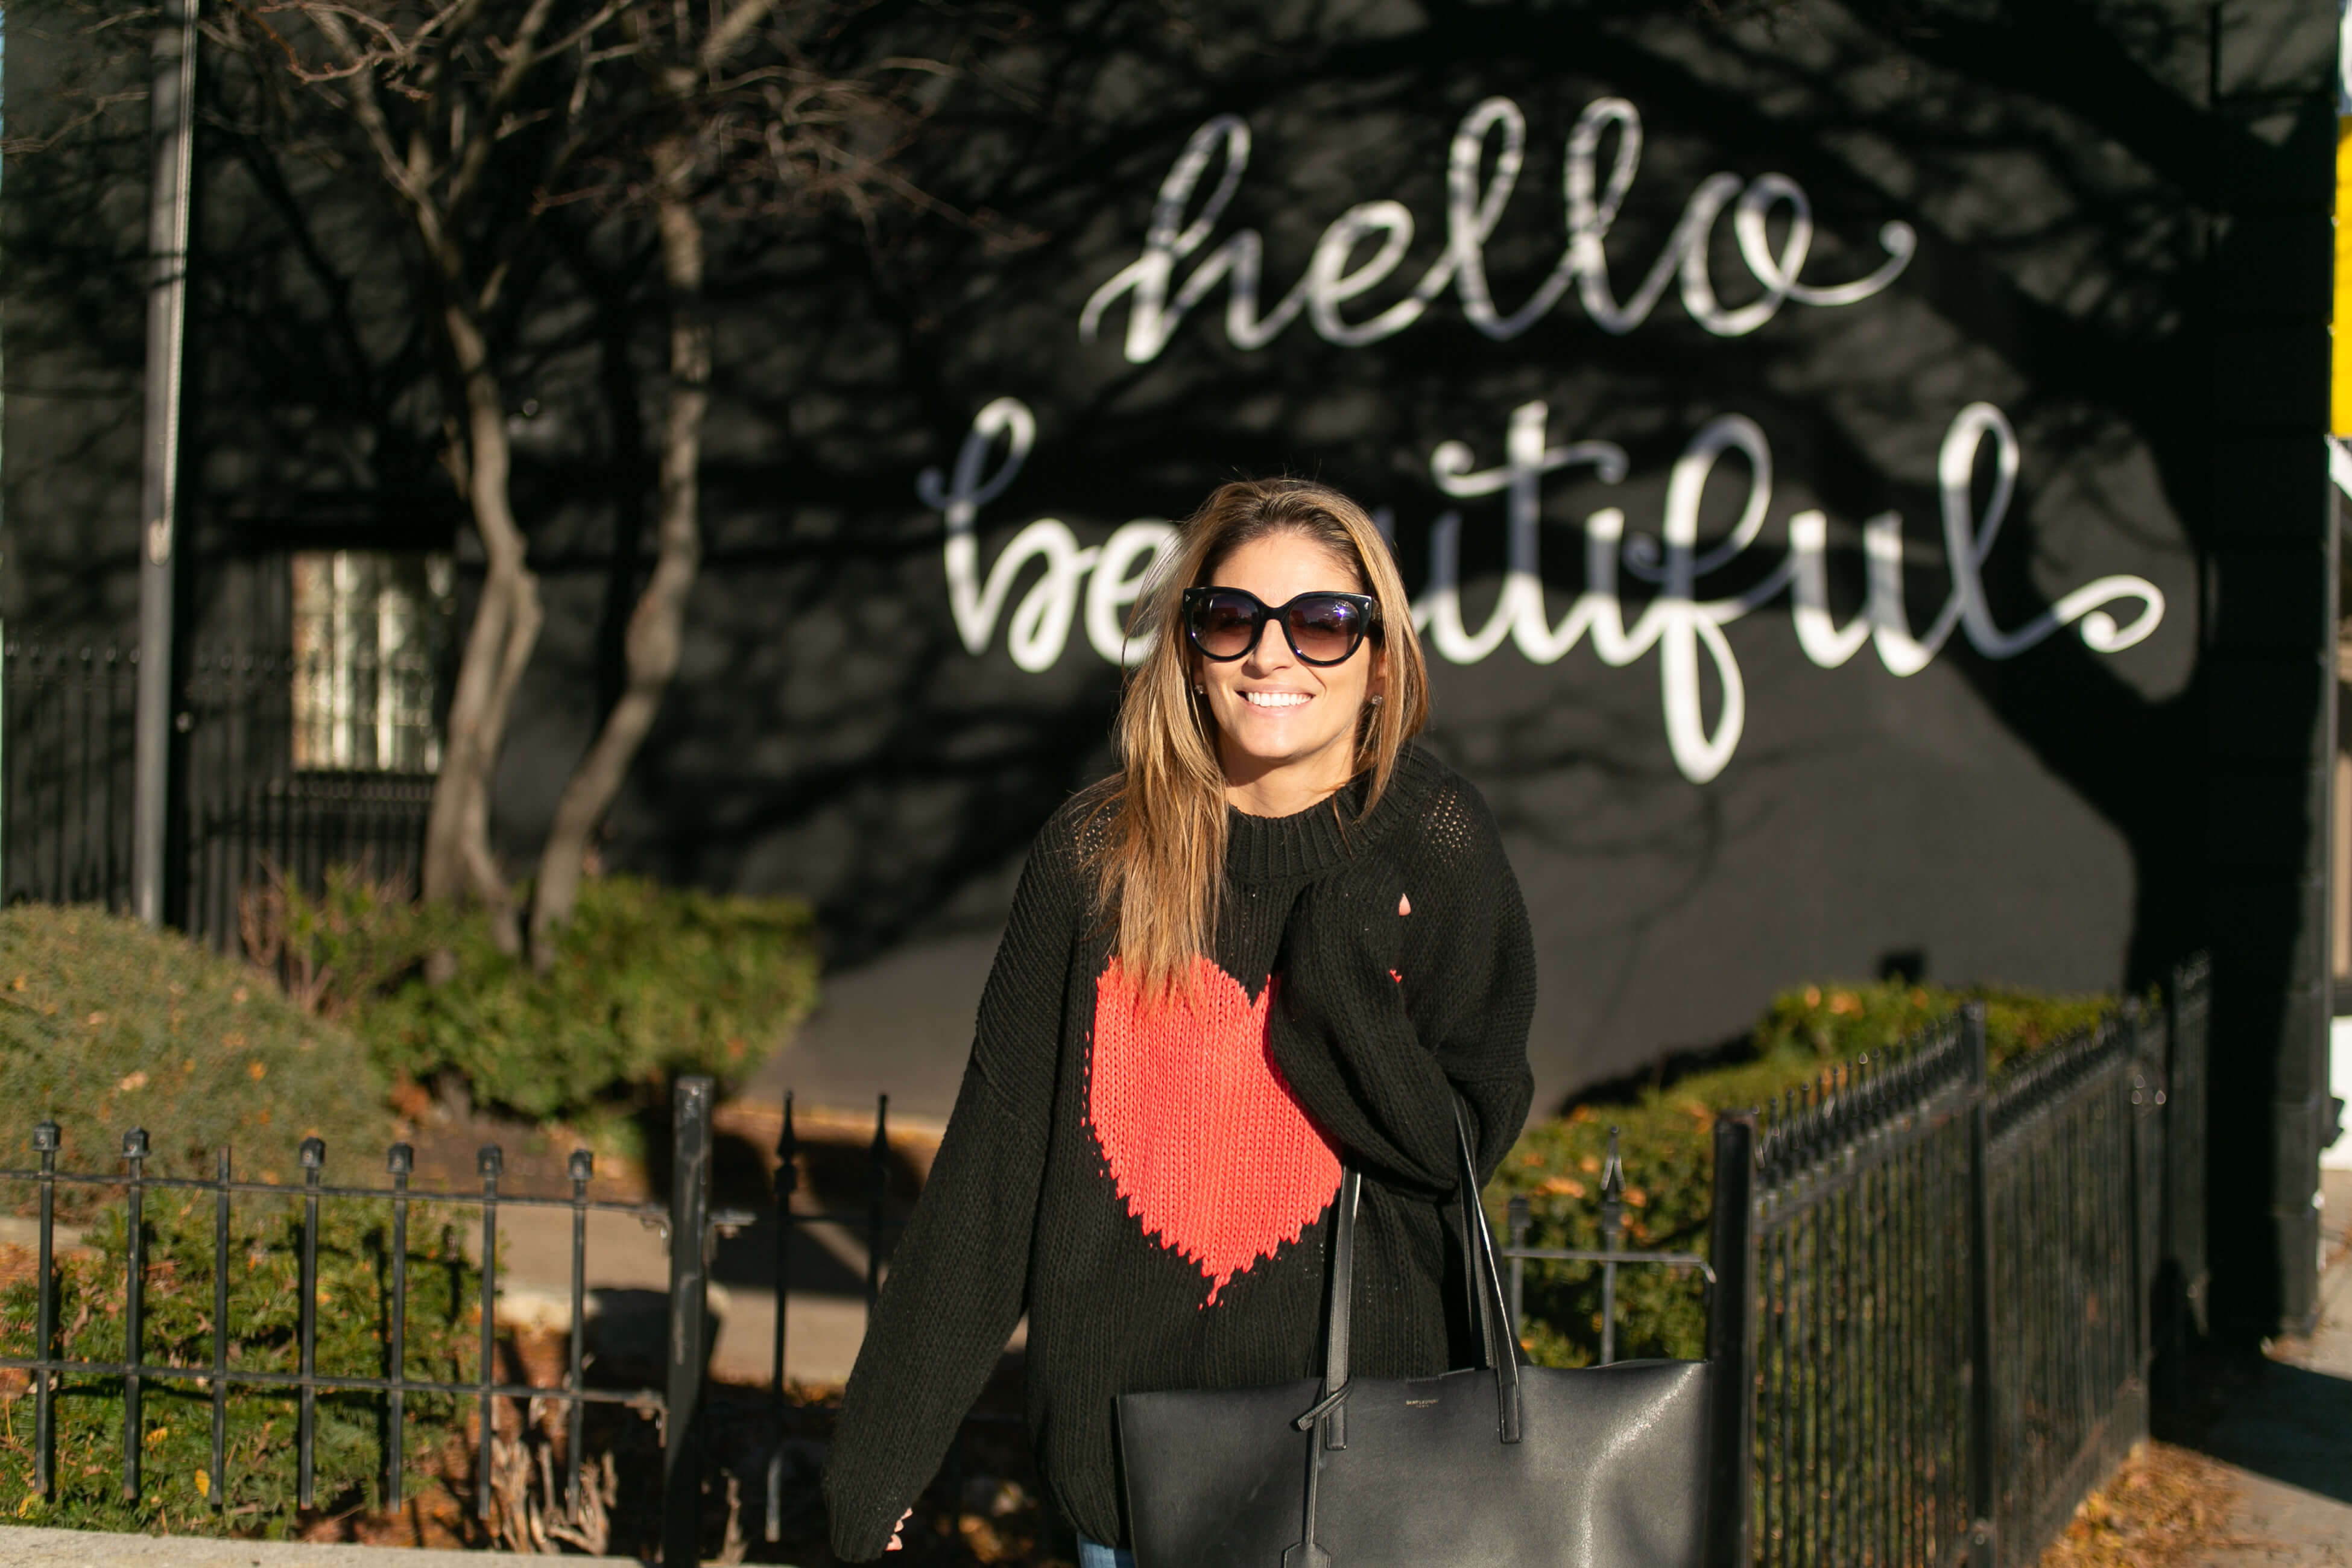 Giant heart sweater chicwish; hello beautiful wall whitby